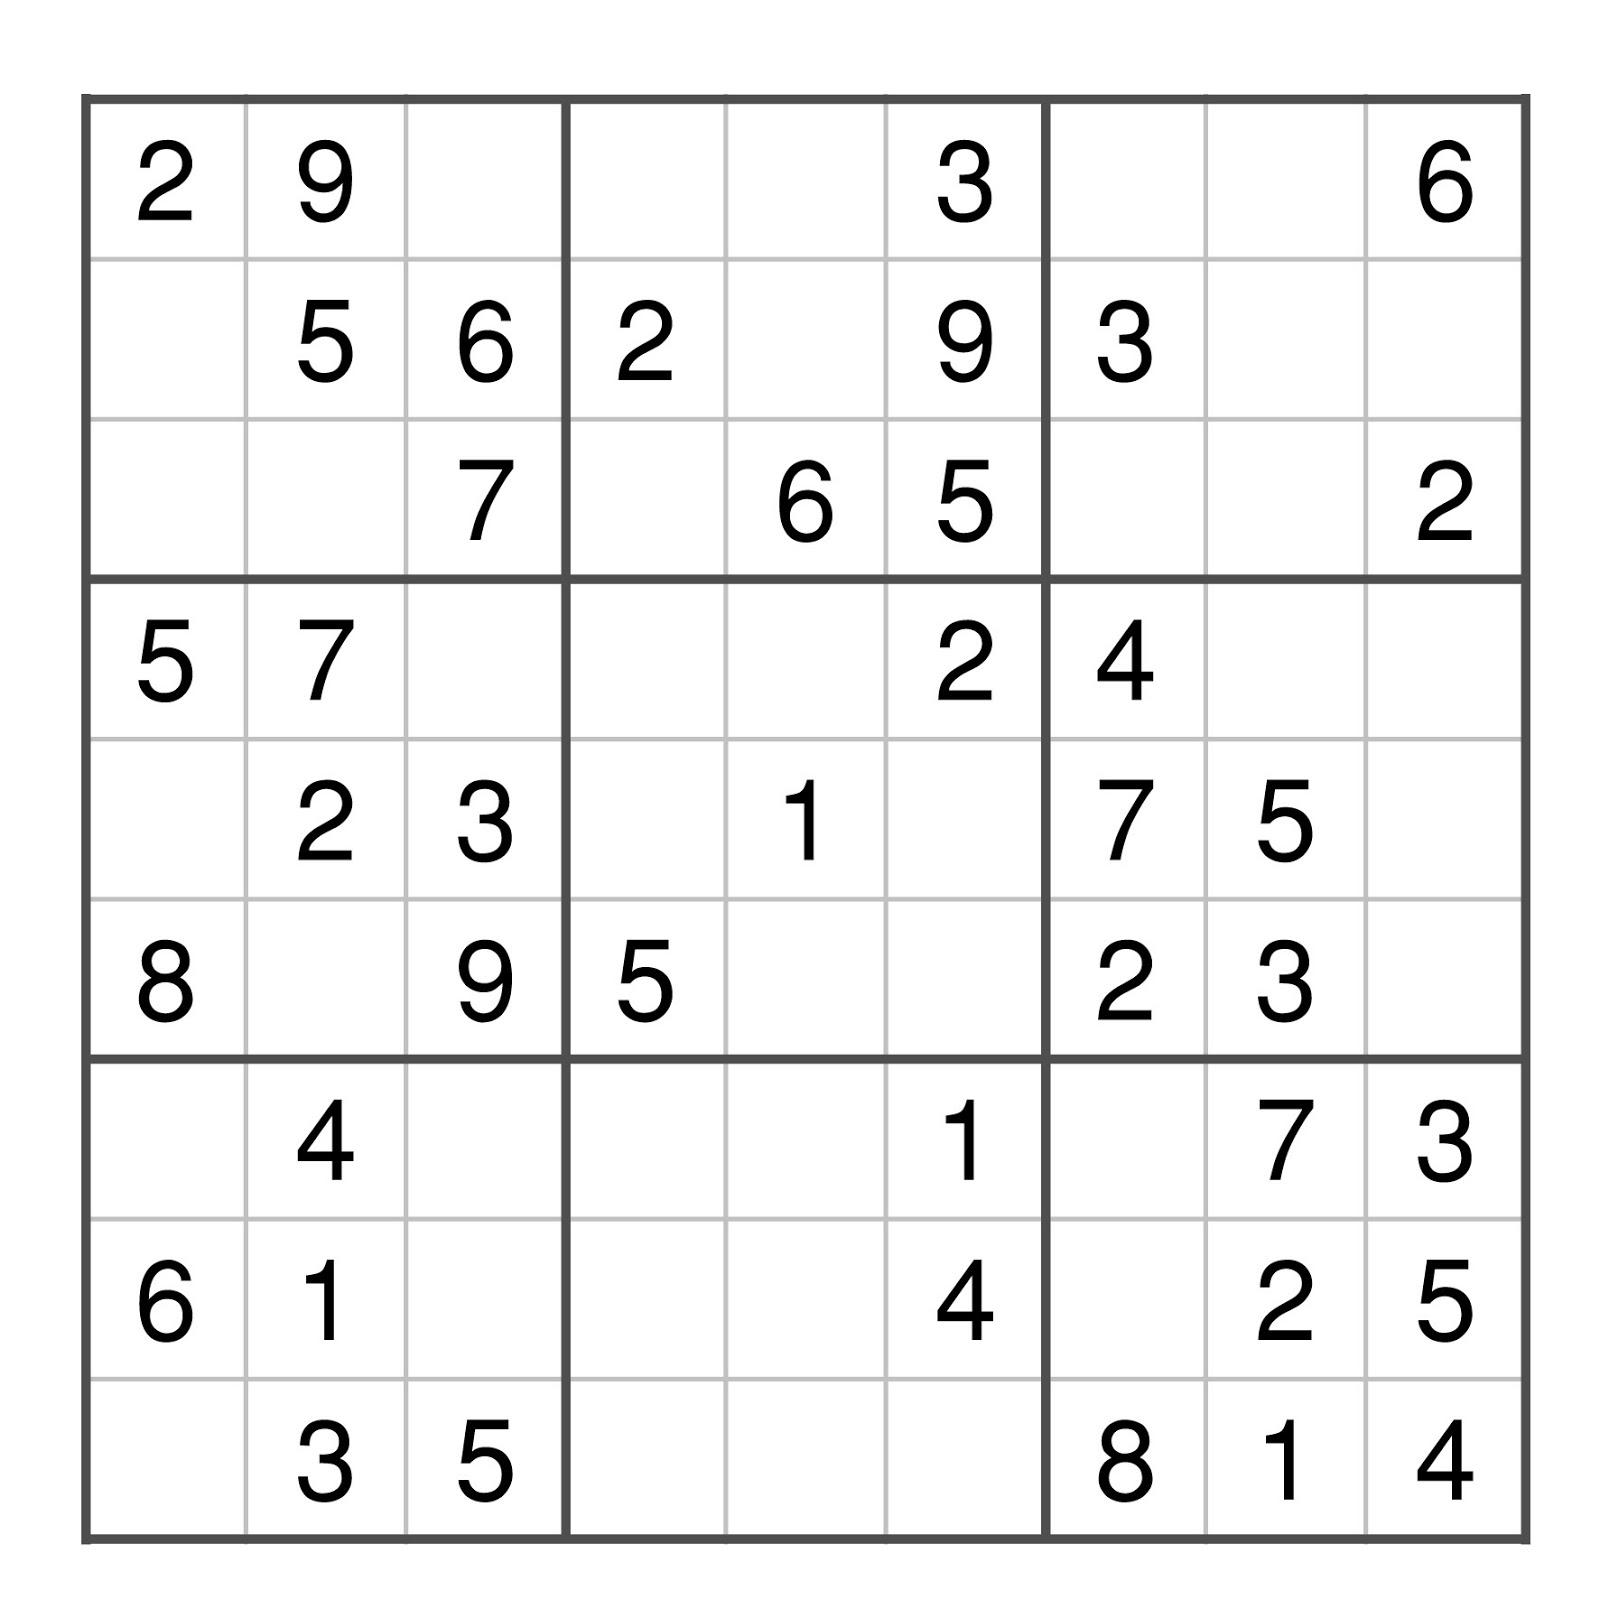 Ad@jmedia (Apei-Jeux): Sudoku Facile N°4 pour Sudoku A Imprimer